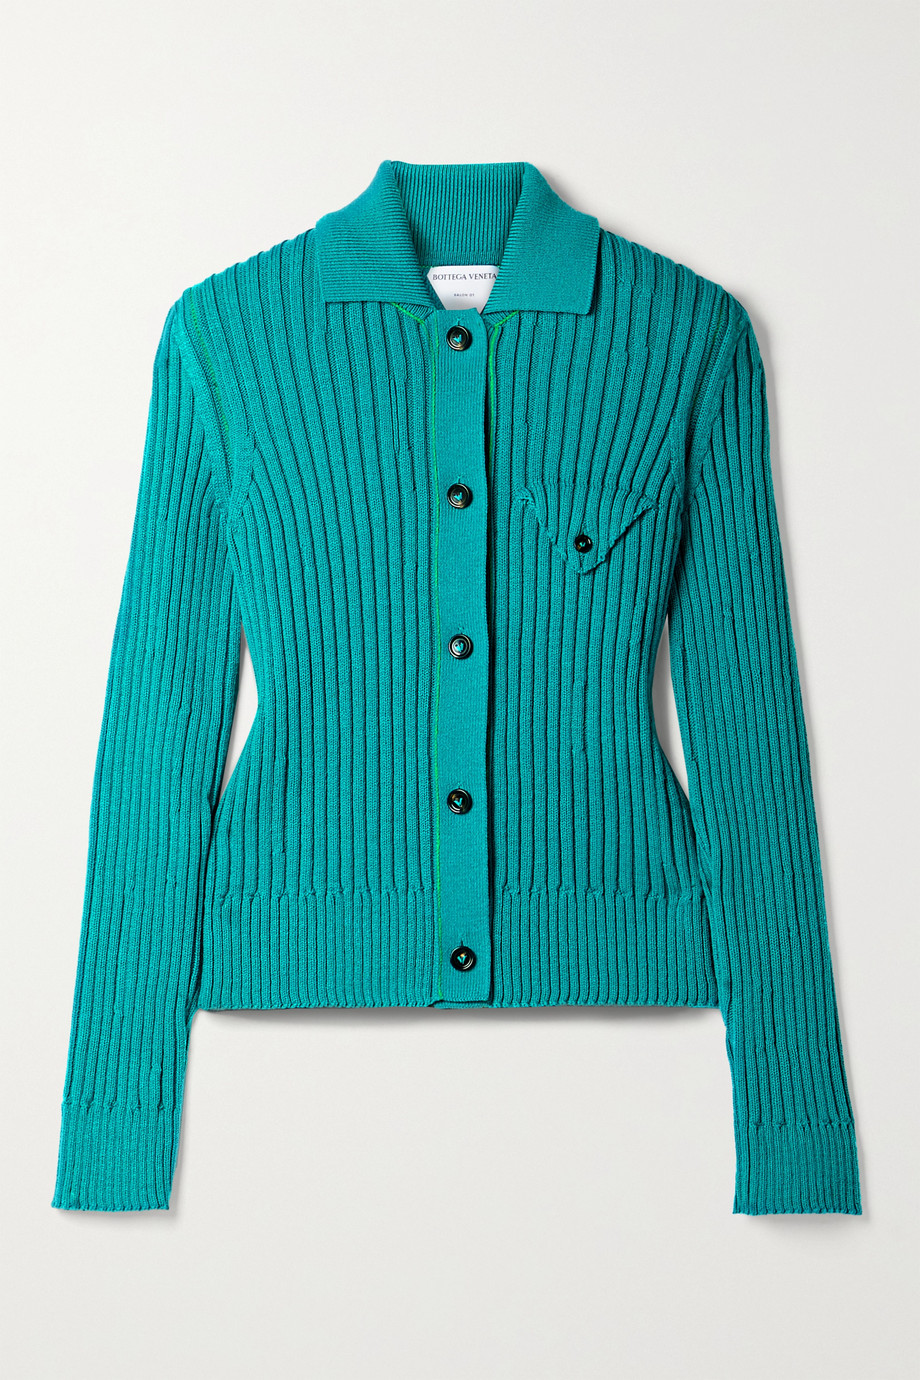 Bottega Veneta Ribbed wool cardigan